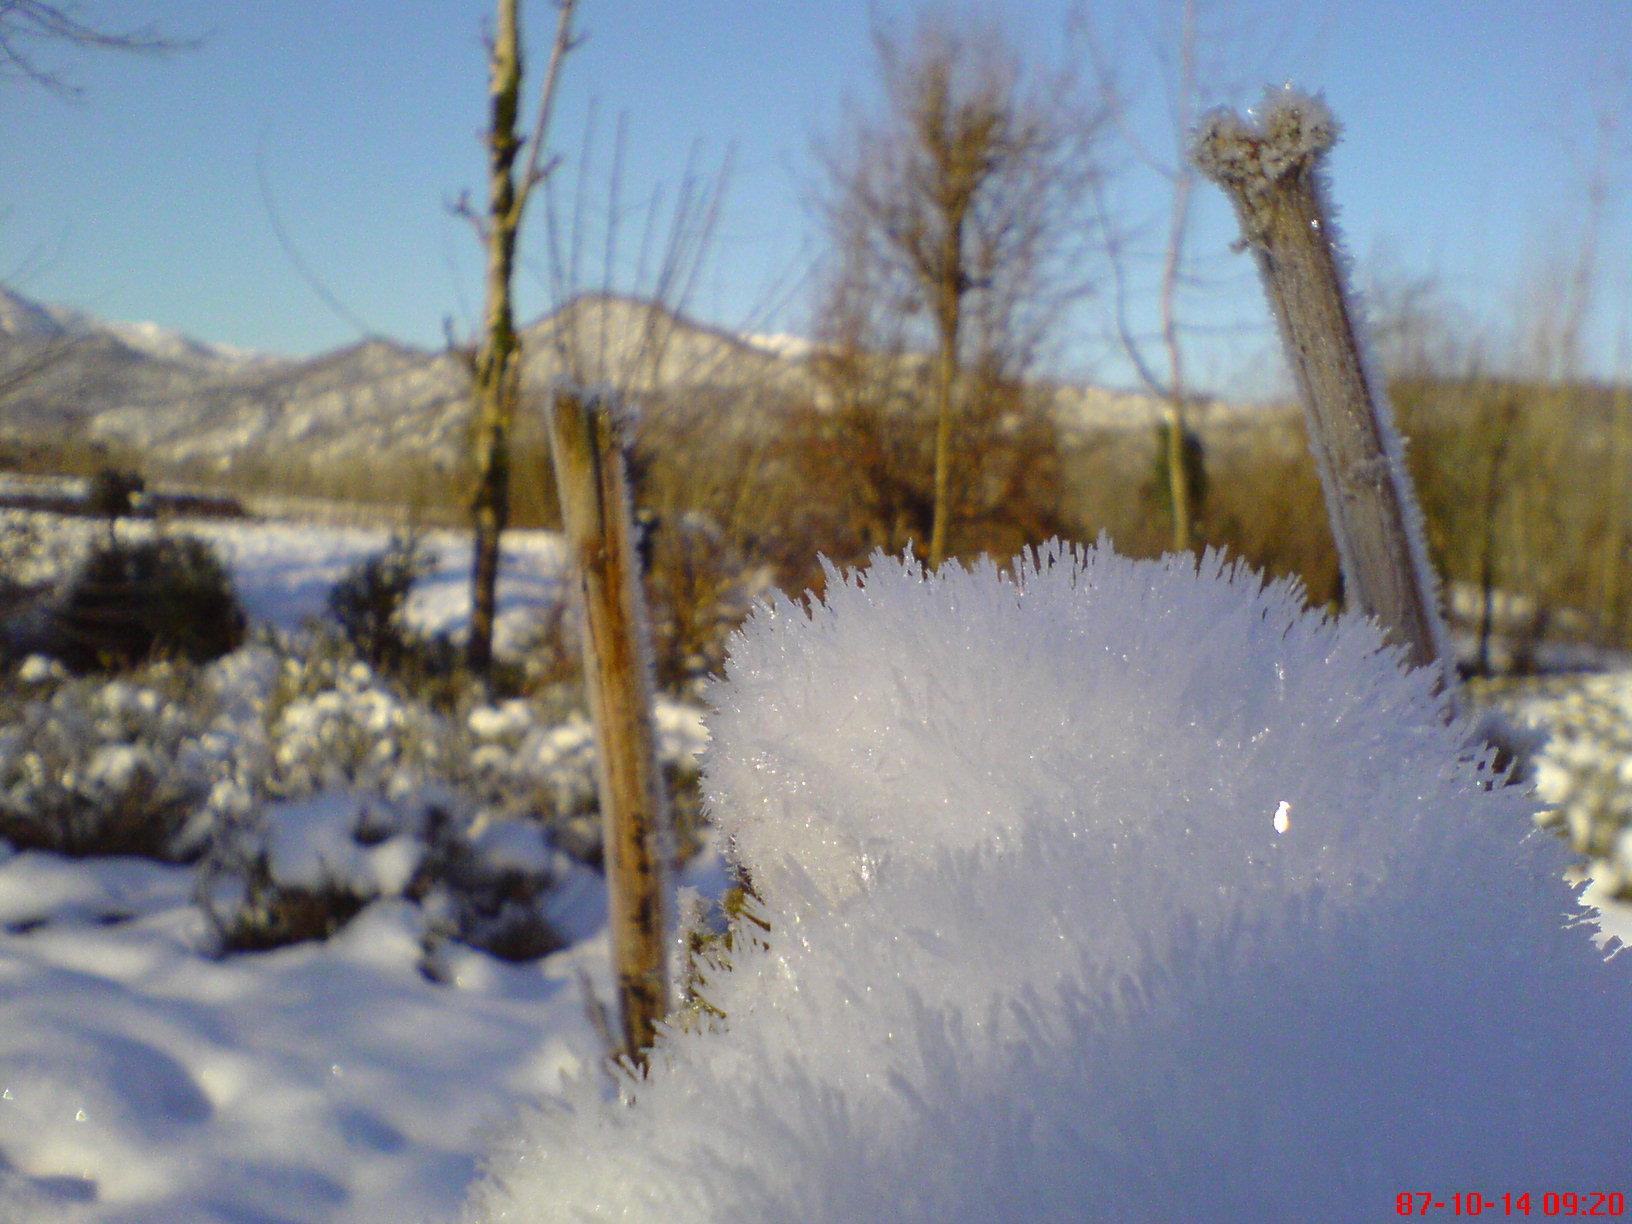 عکس برف زمستانی روستای شولم